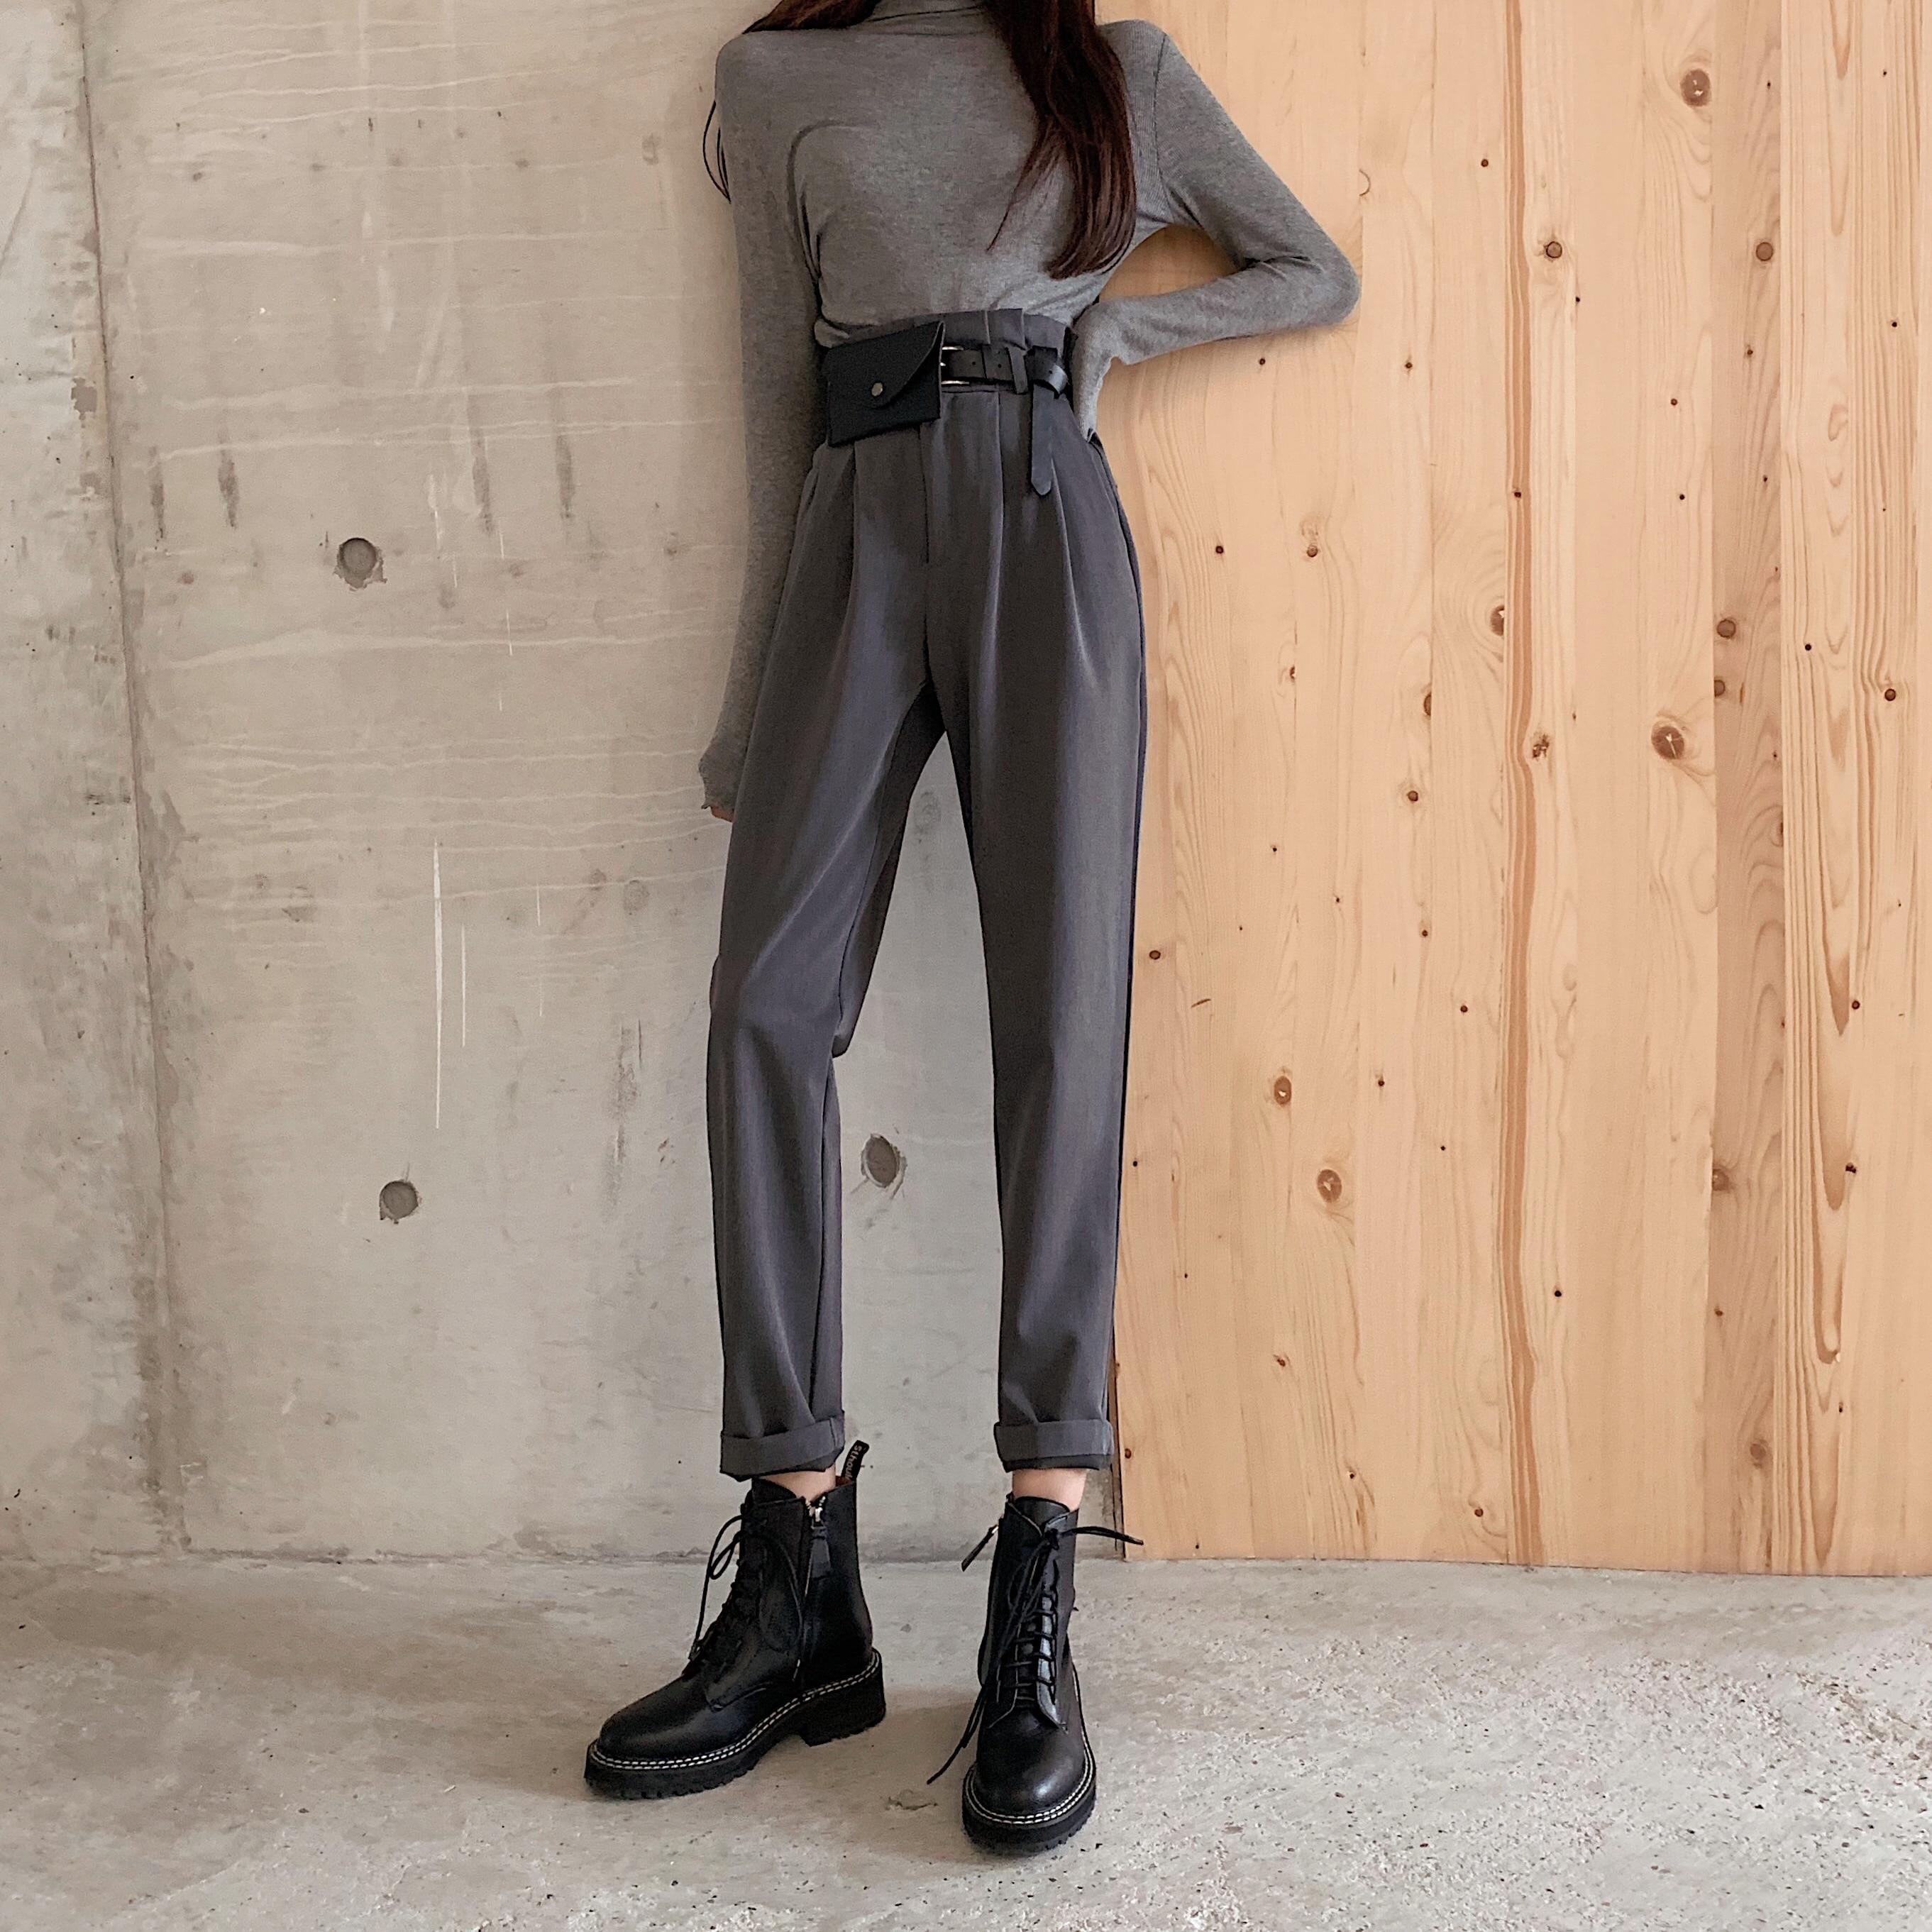 High Waist Harem Pants Elegant Ol Office Straight Trousers Women Black Grey Work Wear Pants Spring Autumn 2019 Vintage Trousers